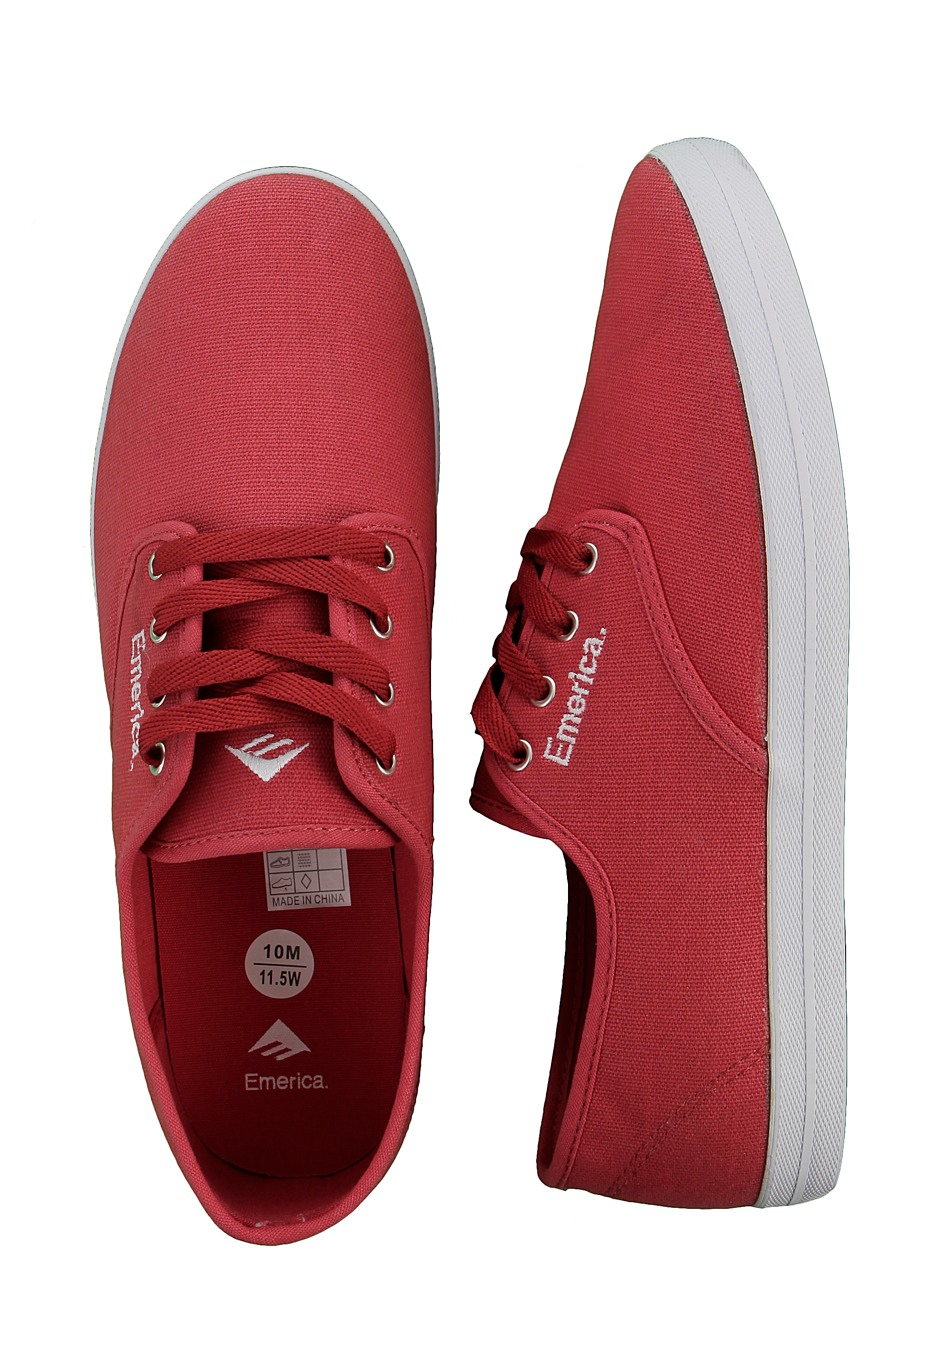 Emerica - Wino Fusion Cardinal - Shoes - Impericon.com UK 1ad247af22